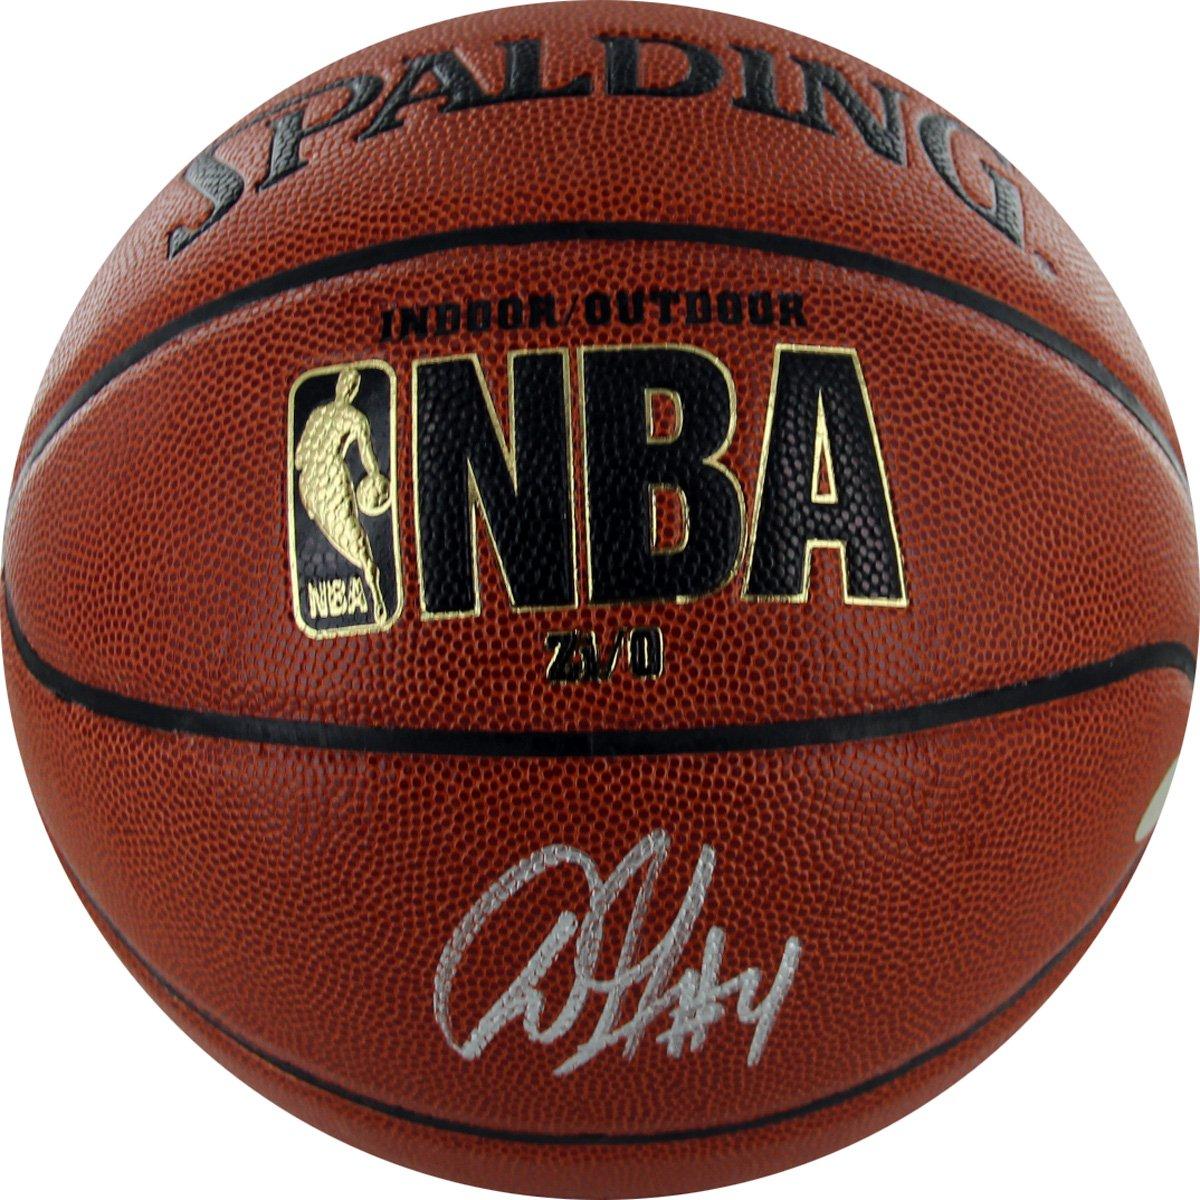 NBA San Antonio Spurs Danny Green Autographed Basketball, Brown Steiner Sports GREEBKS000000